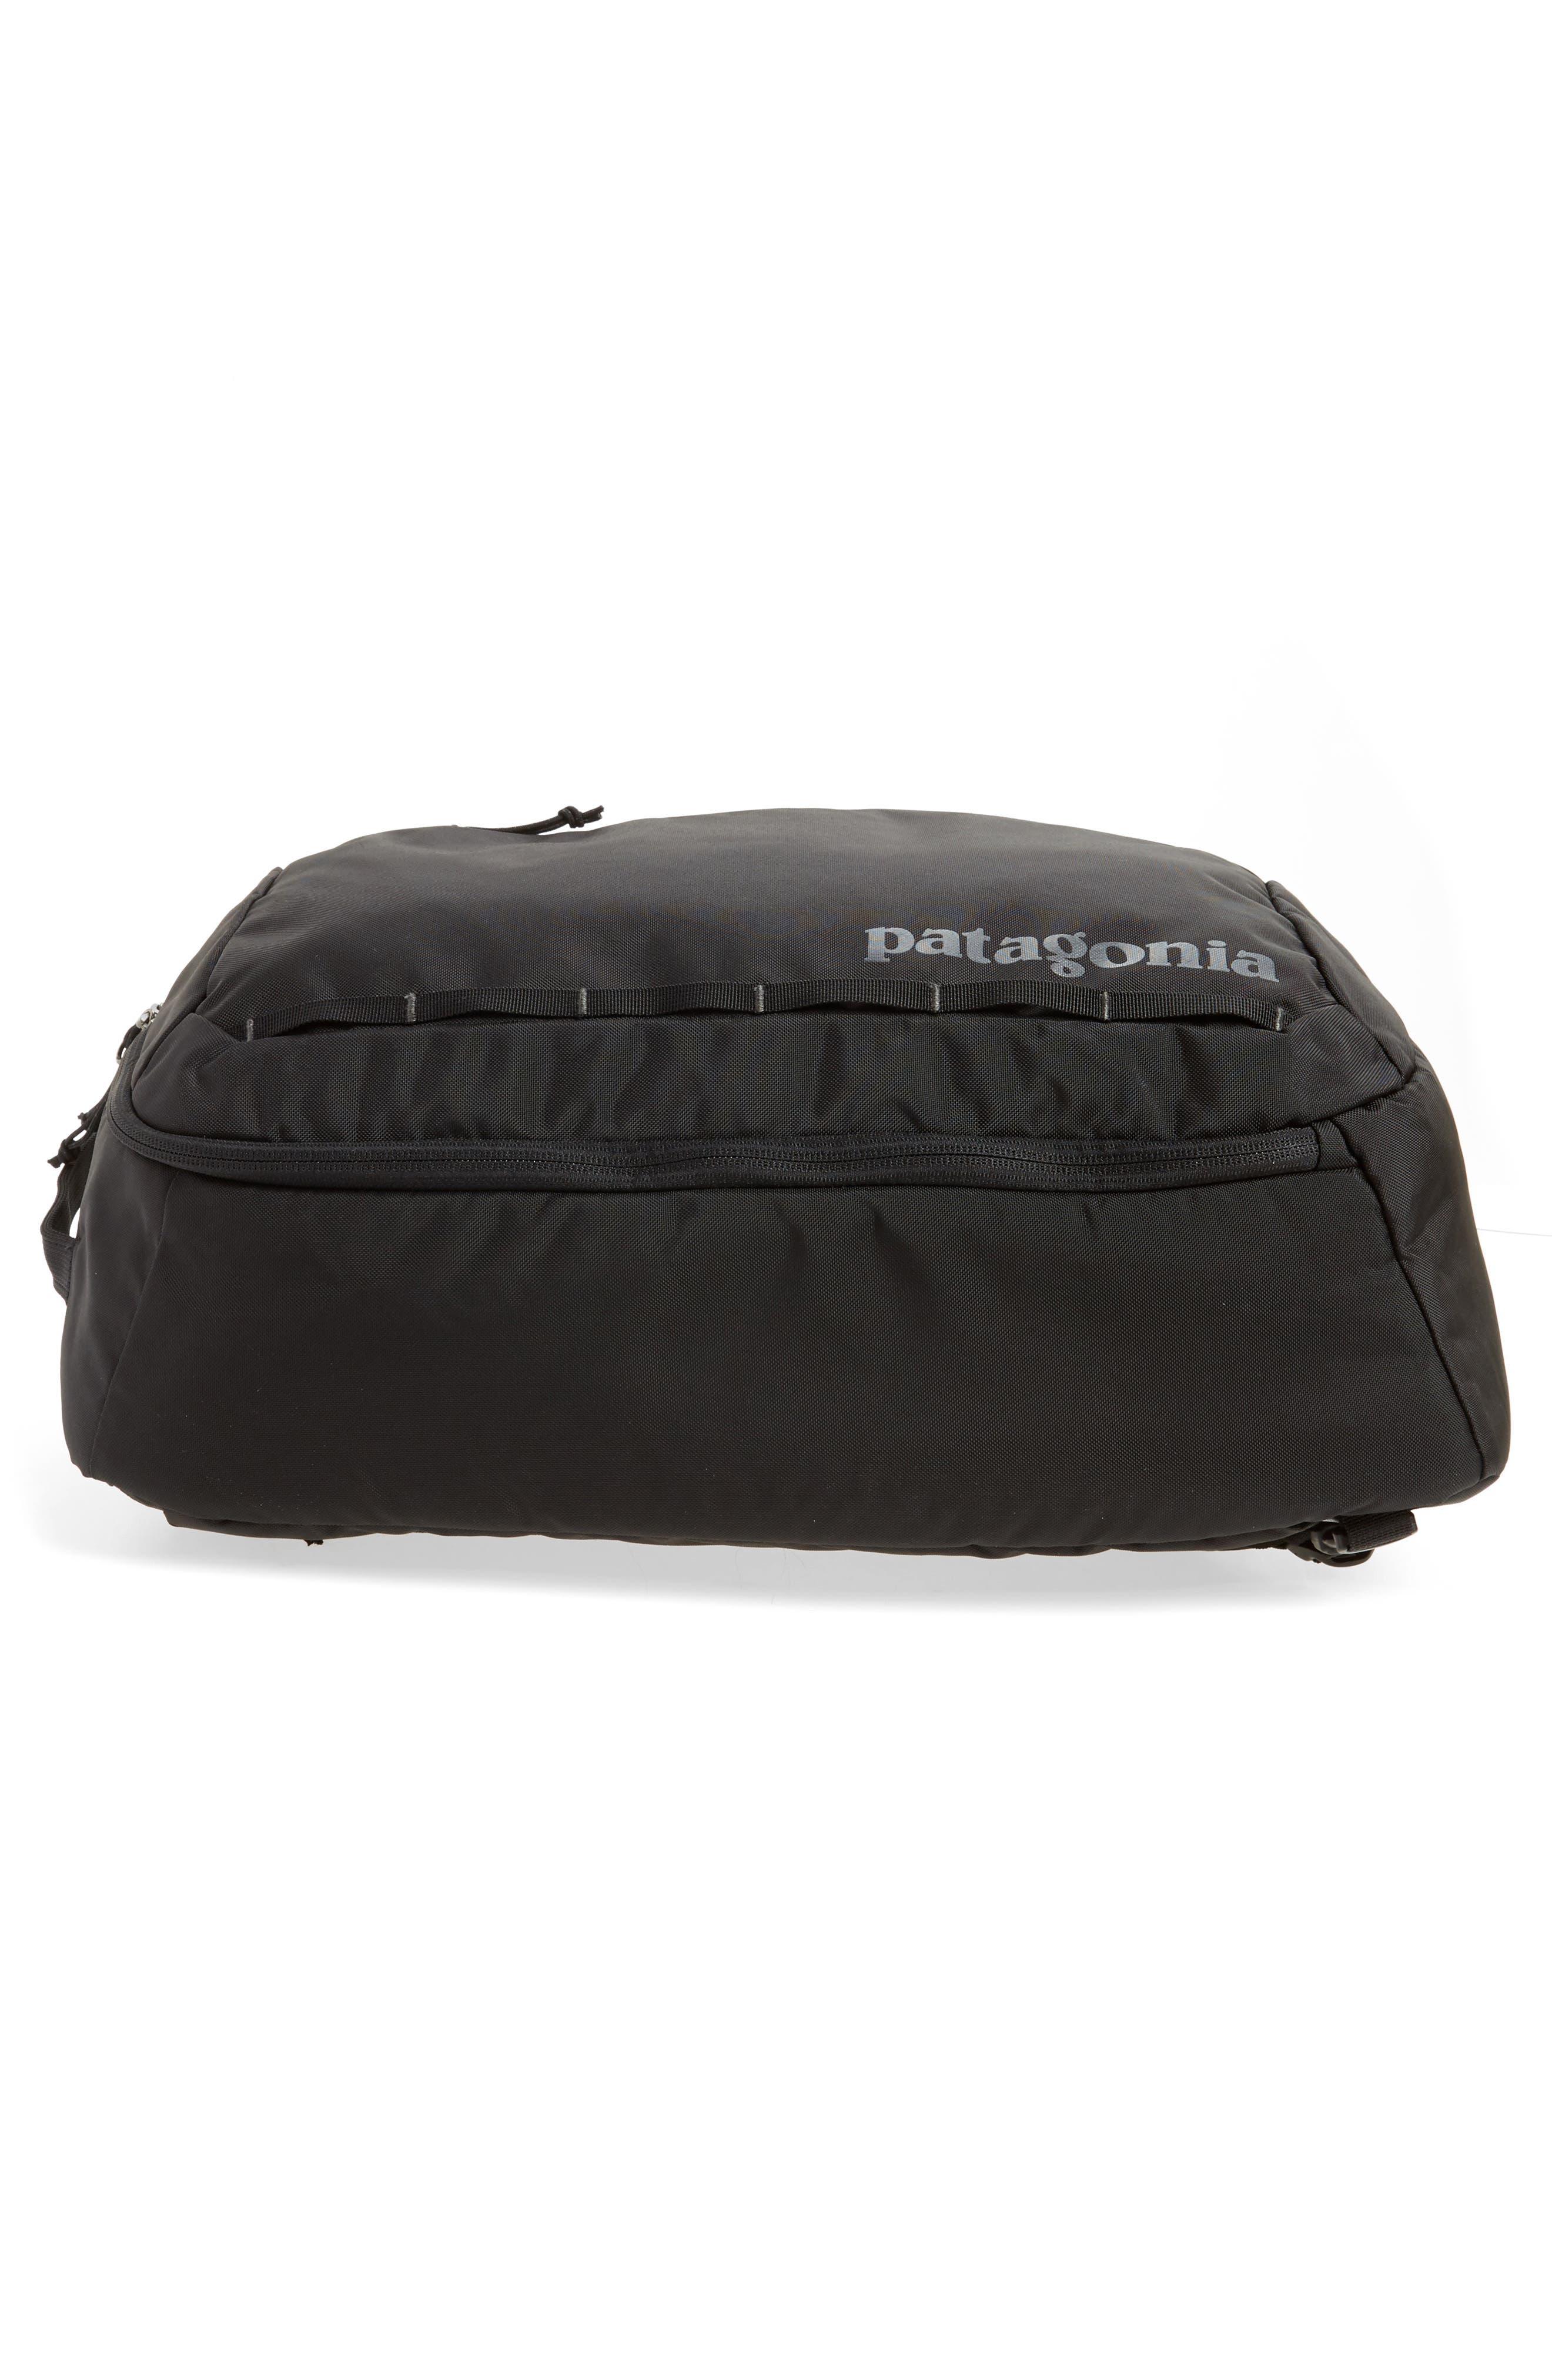 Tres 25-Liter Convertible Backpack,                             Alternate thumbnail 6, color,                             BLACK